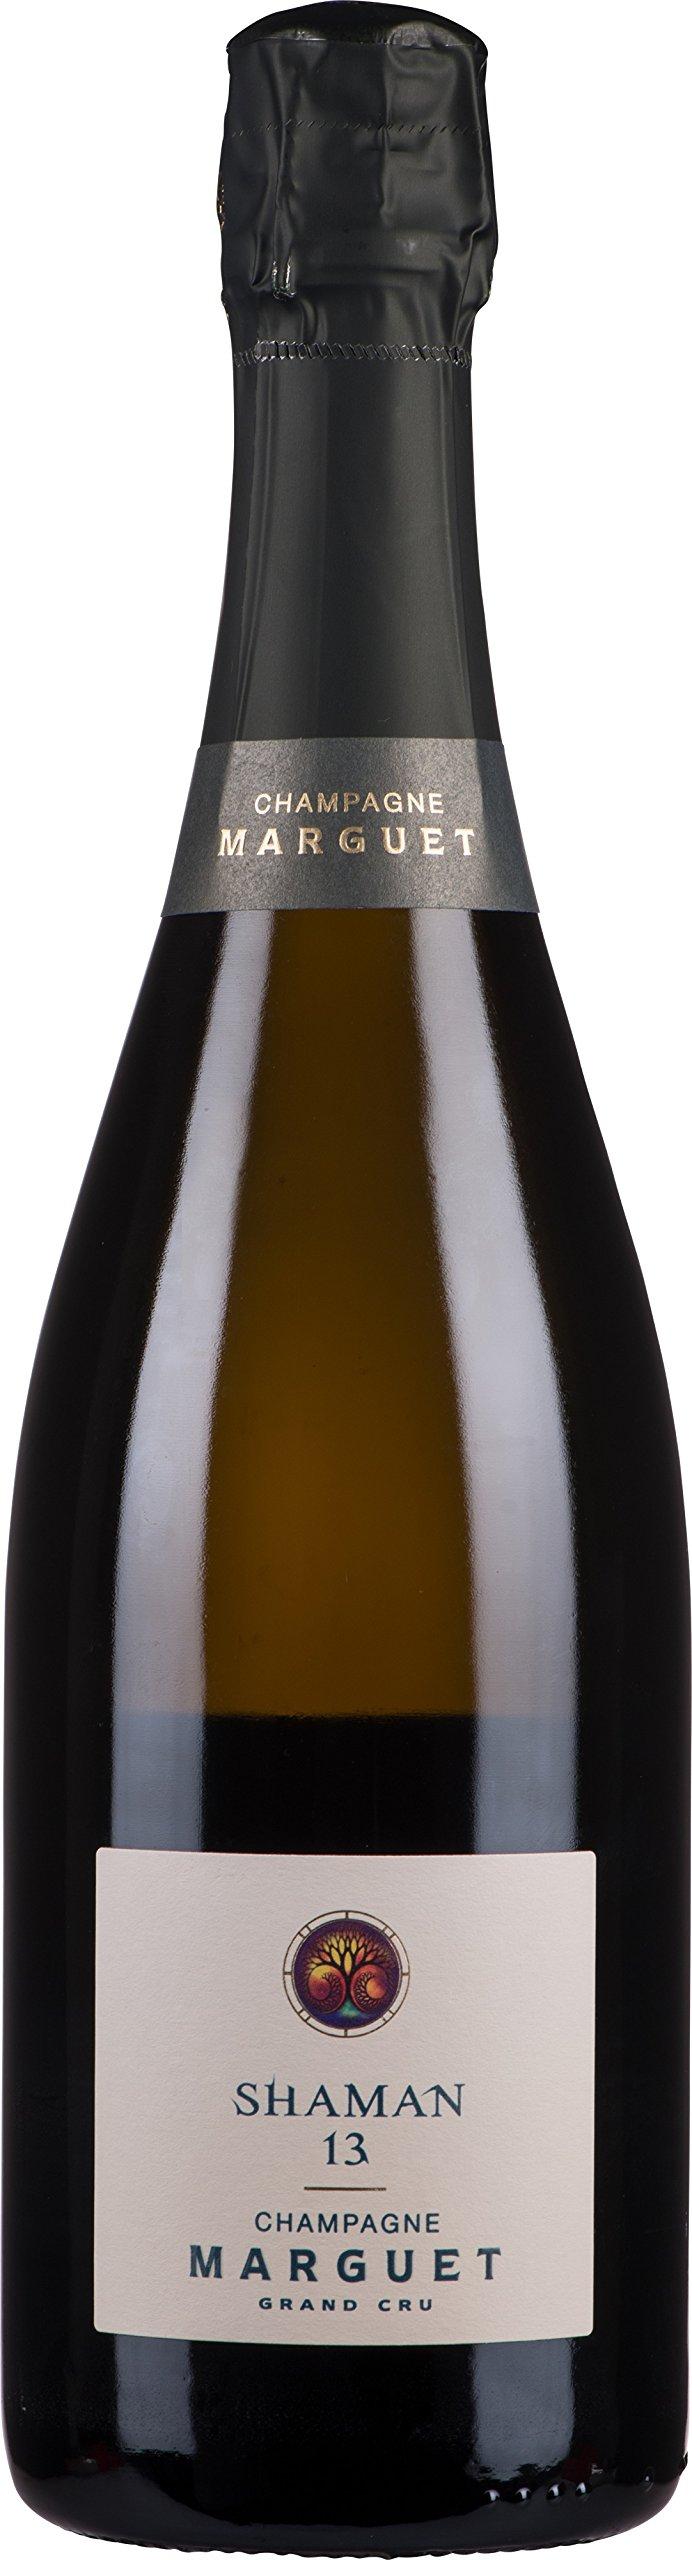 Marguet-Champagne-Shaman-Extra-Brut-Grand-Cru